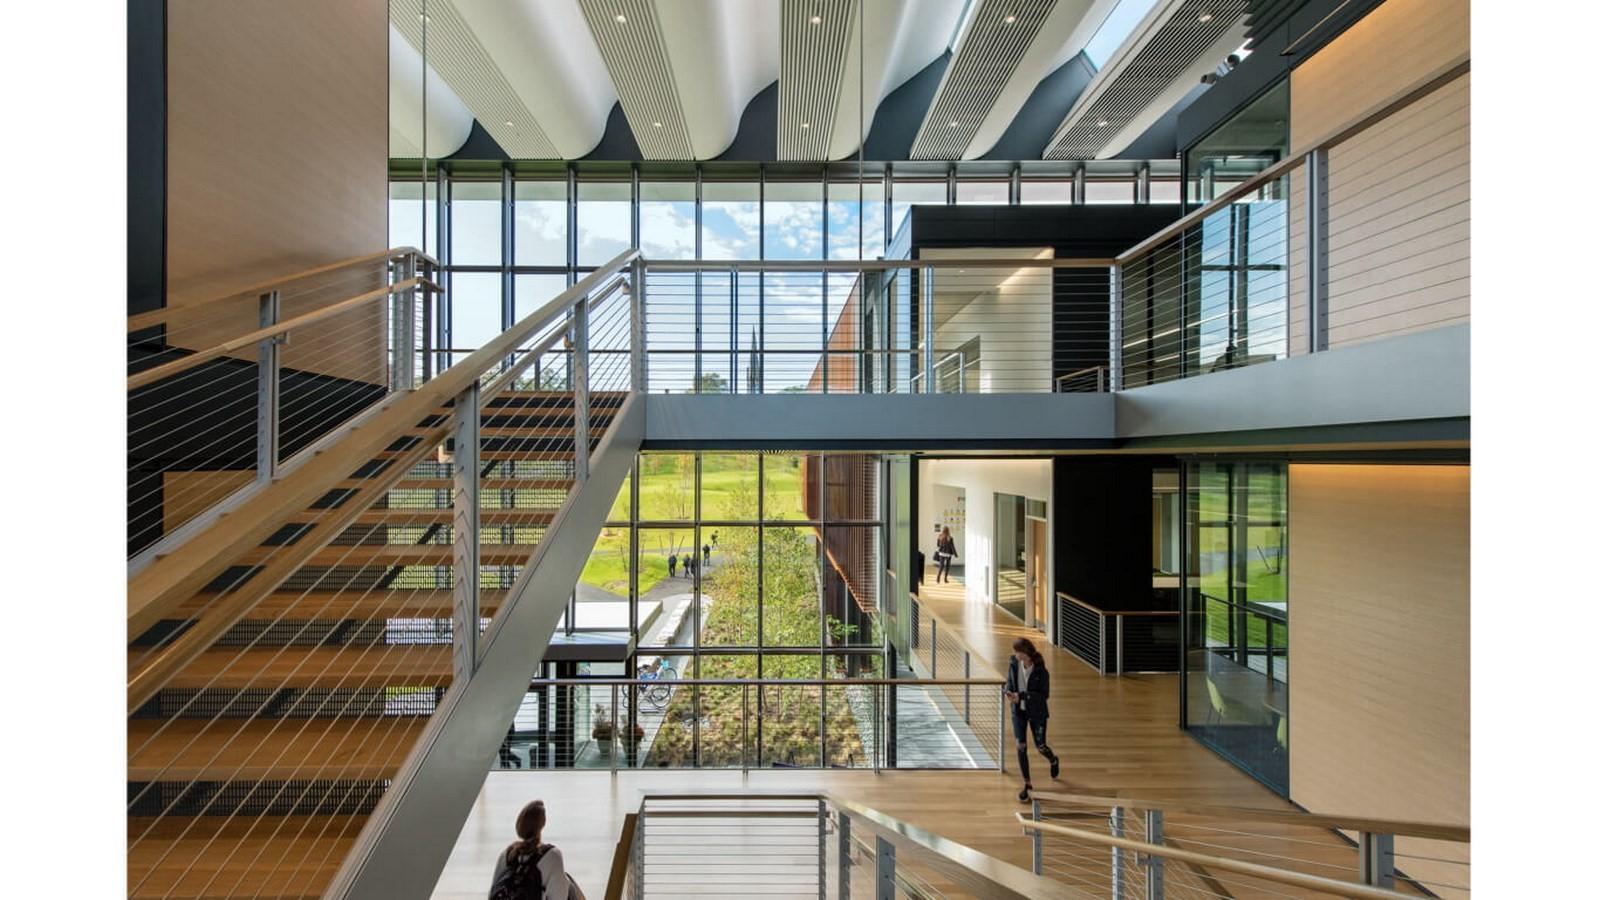 Amherst College Science Centre, Amherst, Massachusetts - Sheet2